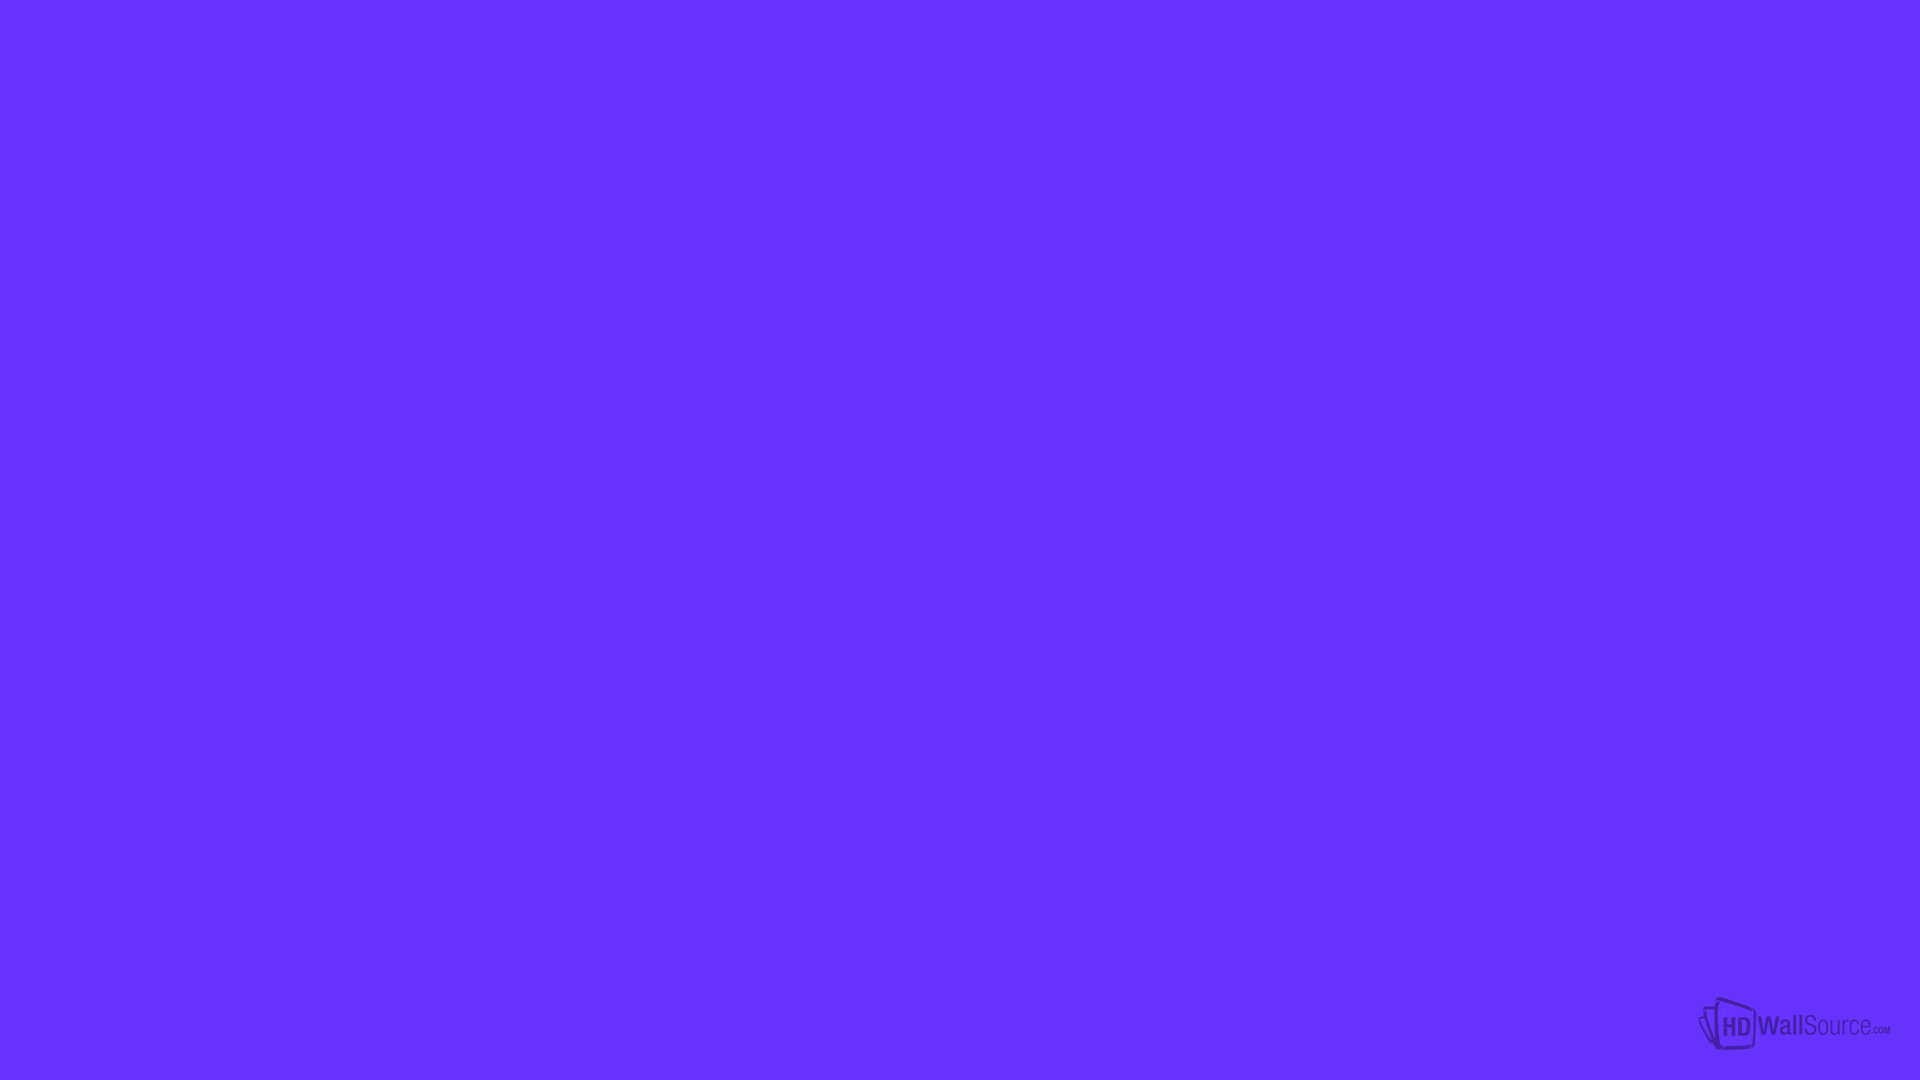 6633ff wallpaper 71048